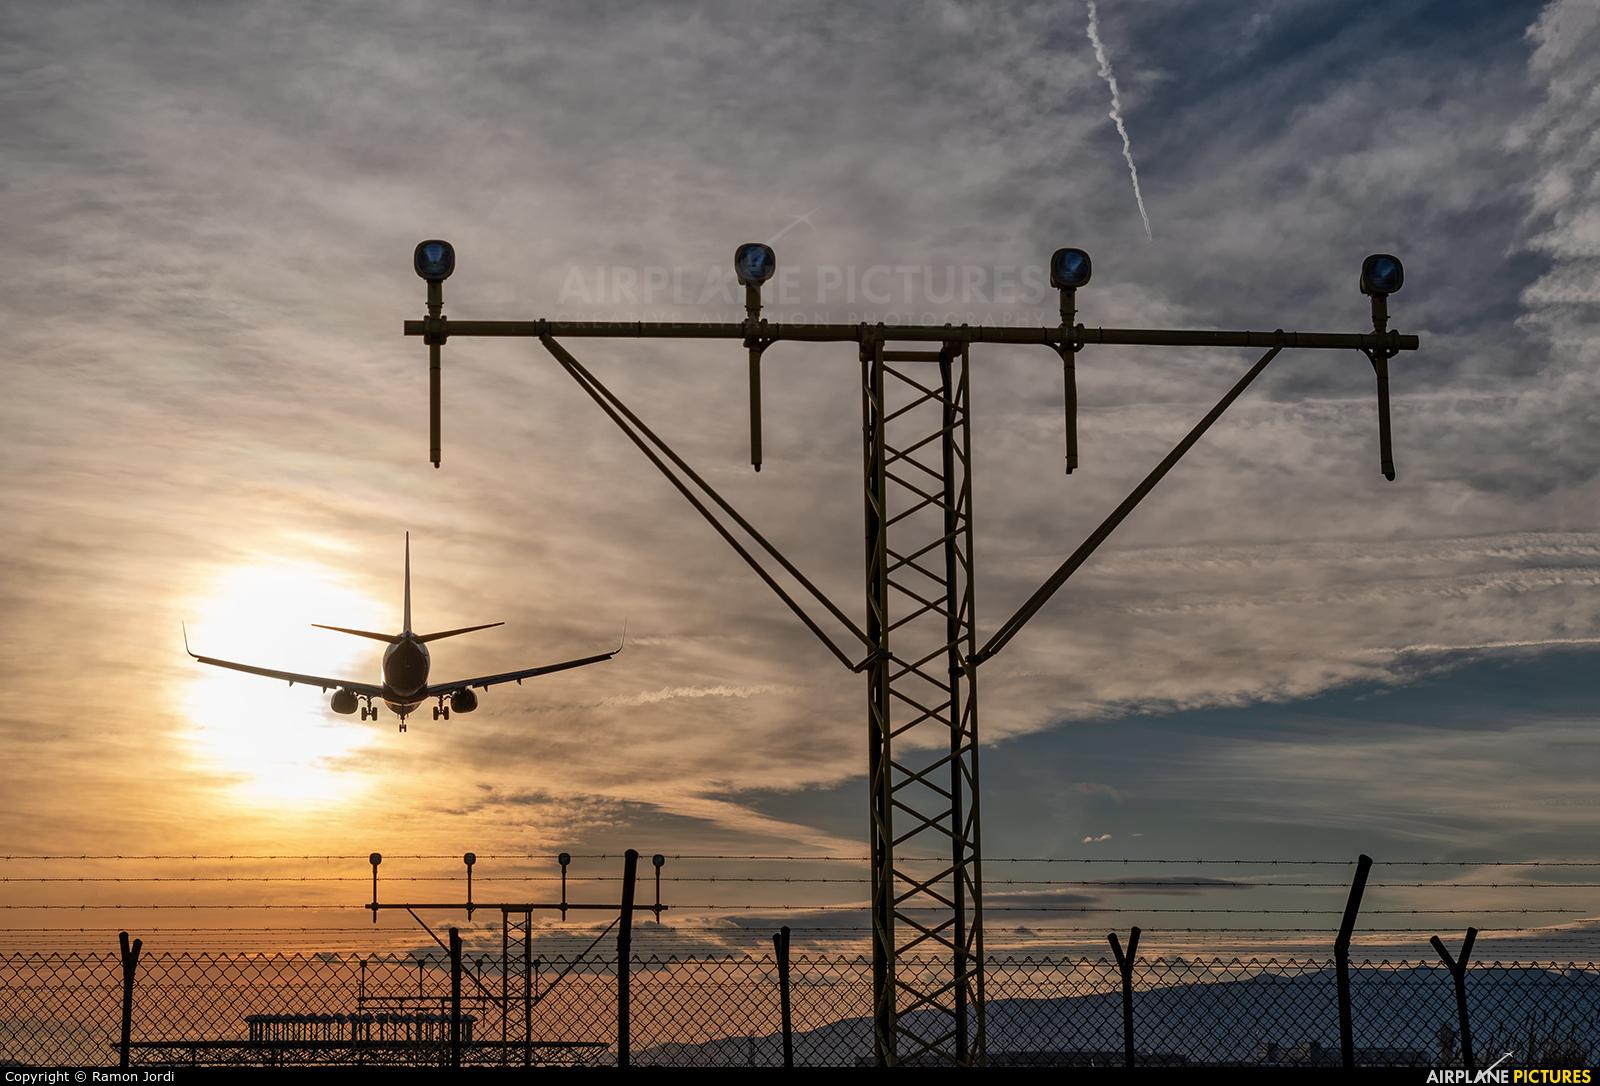 Air Baltic YL-CSH aircraft at Barcelona - El Prat